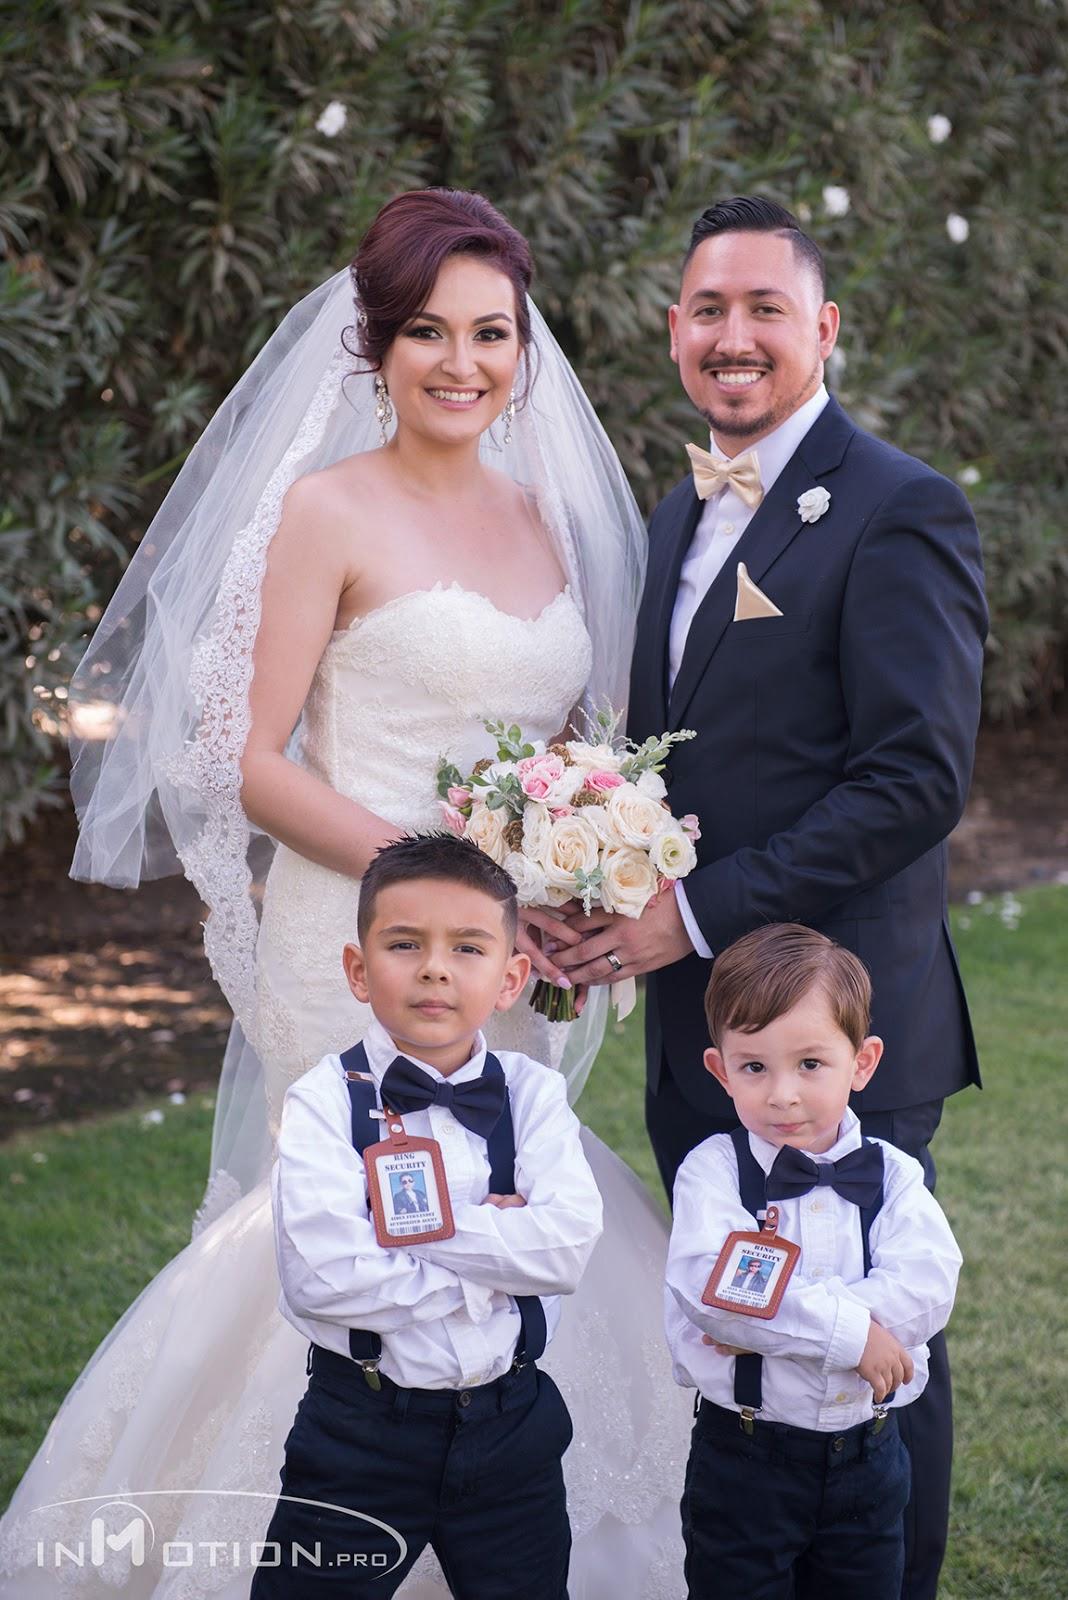 Lesley and Alvaros Wedding Delano California September 26 2015